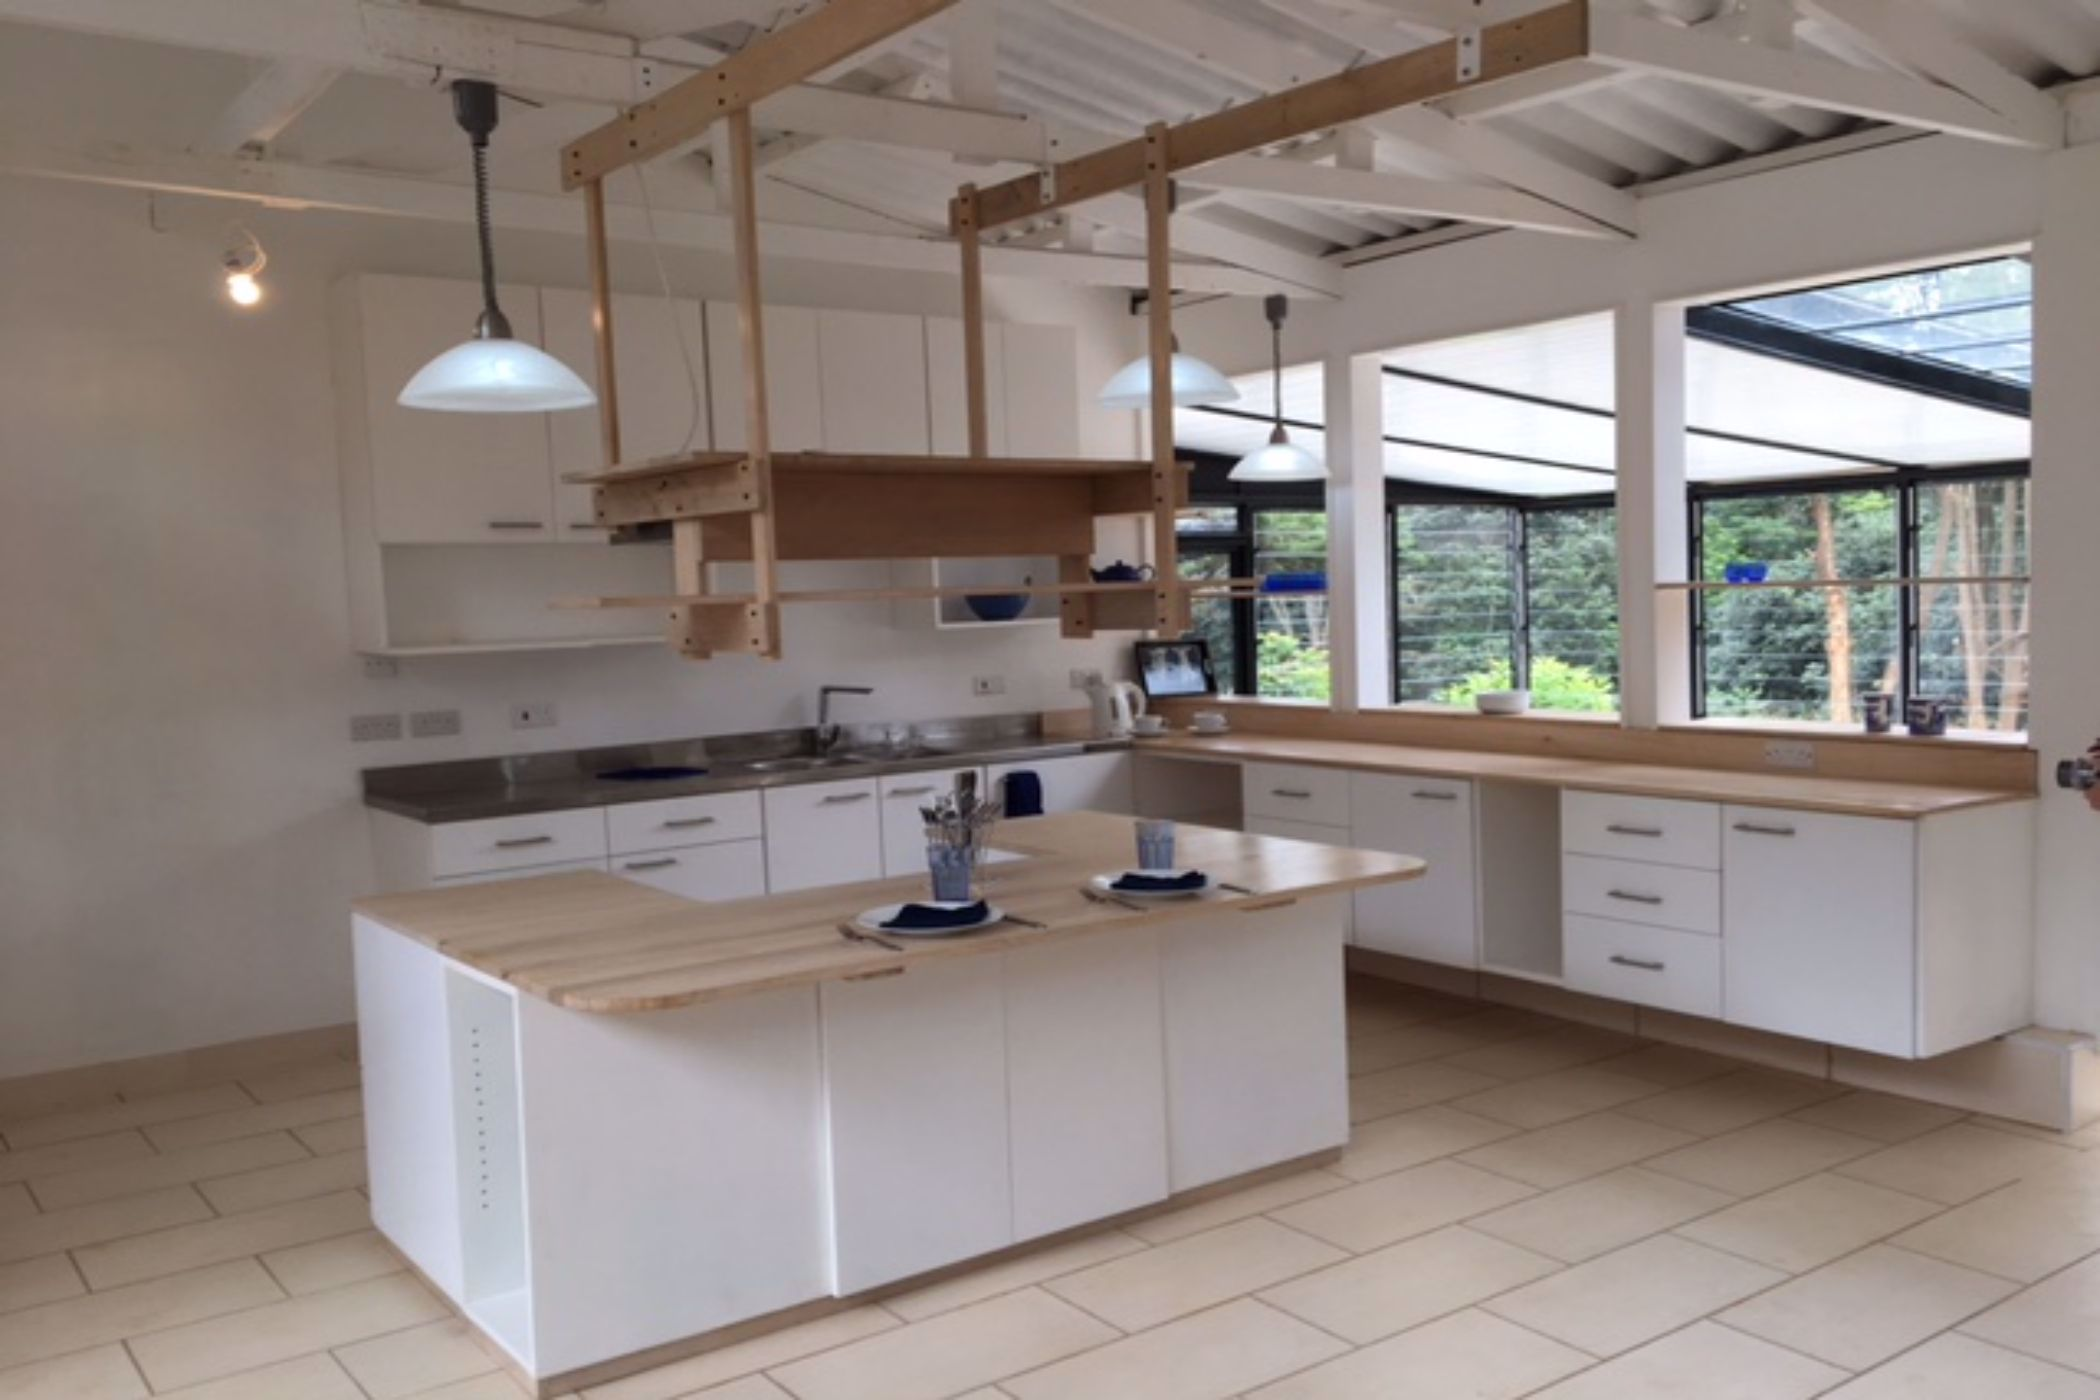 3 bedroom house to rent in Kitisuru (Kenya)